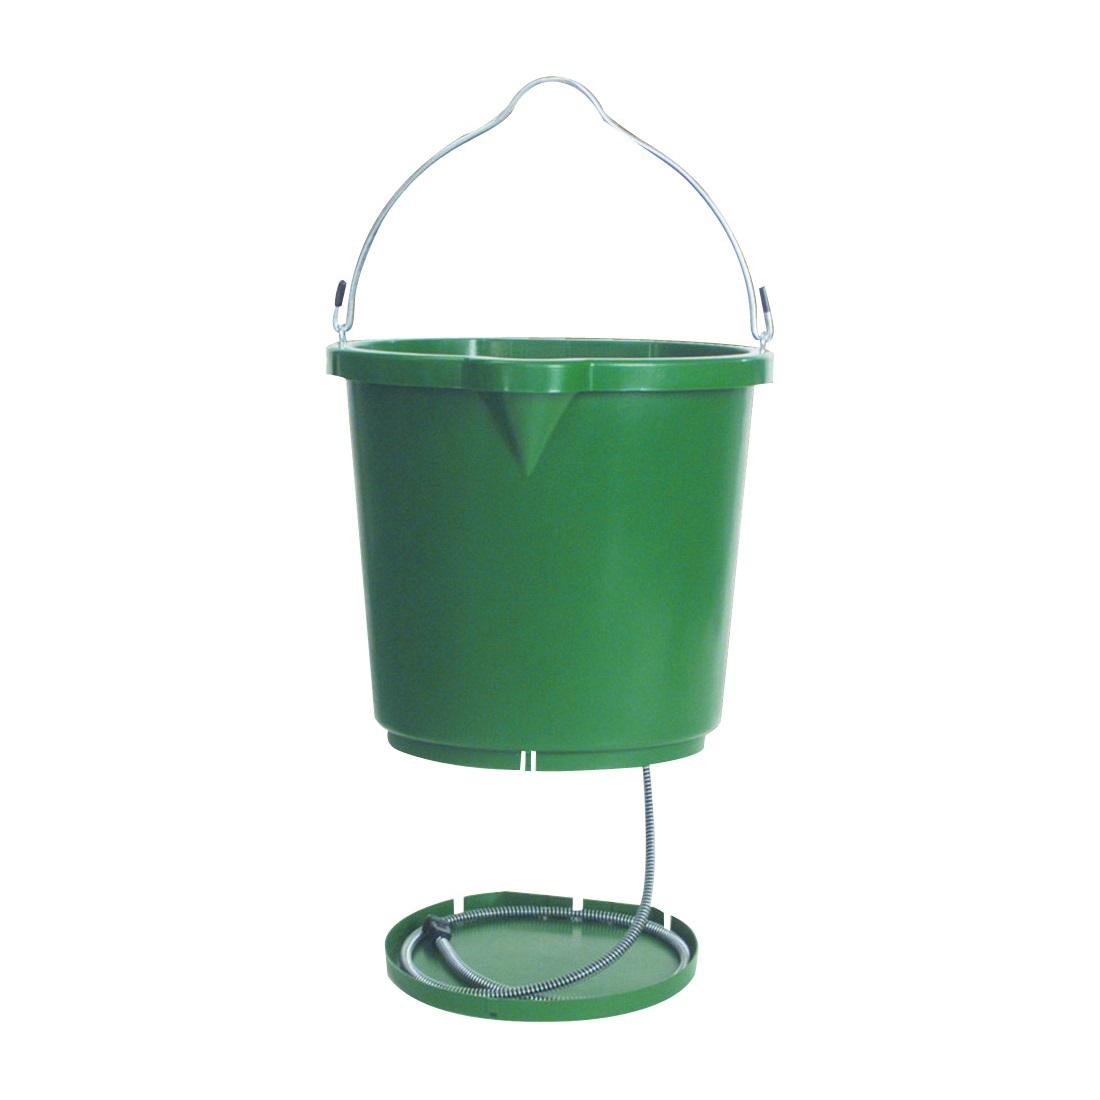 Picture of FARM INNOVATORS FB120 Heated Bucket, Polyethylene, Green